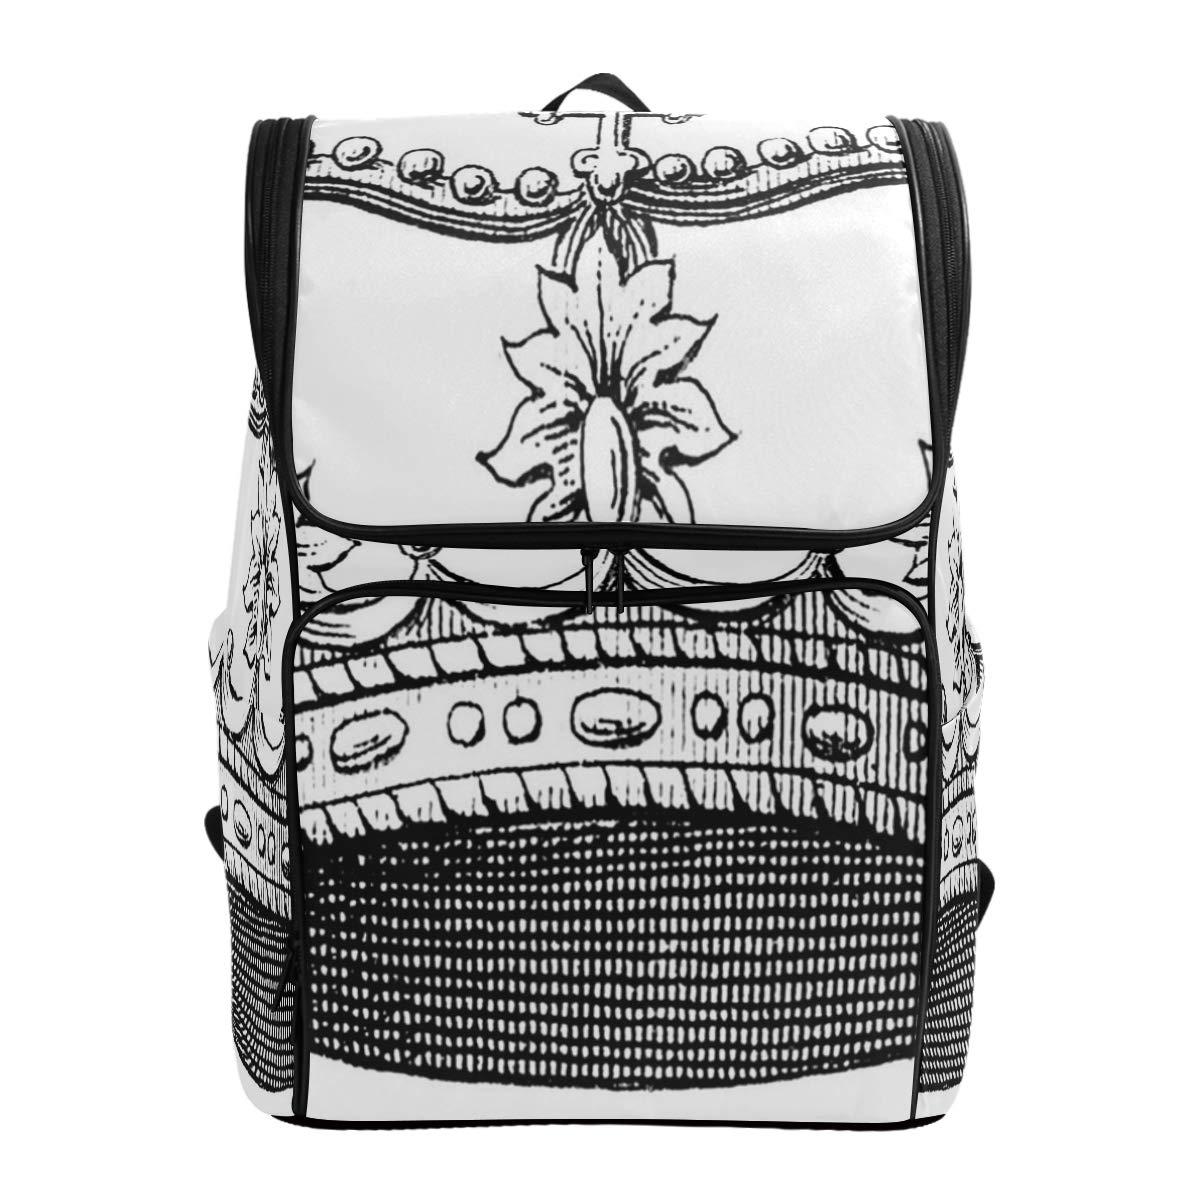 Travel Backpack Coral And Teal Floral School Backpack for Men Large Backpacking Bag